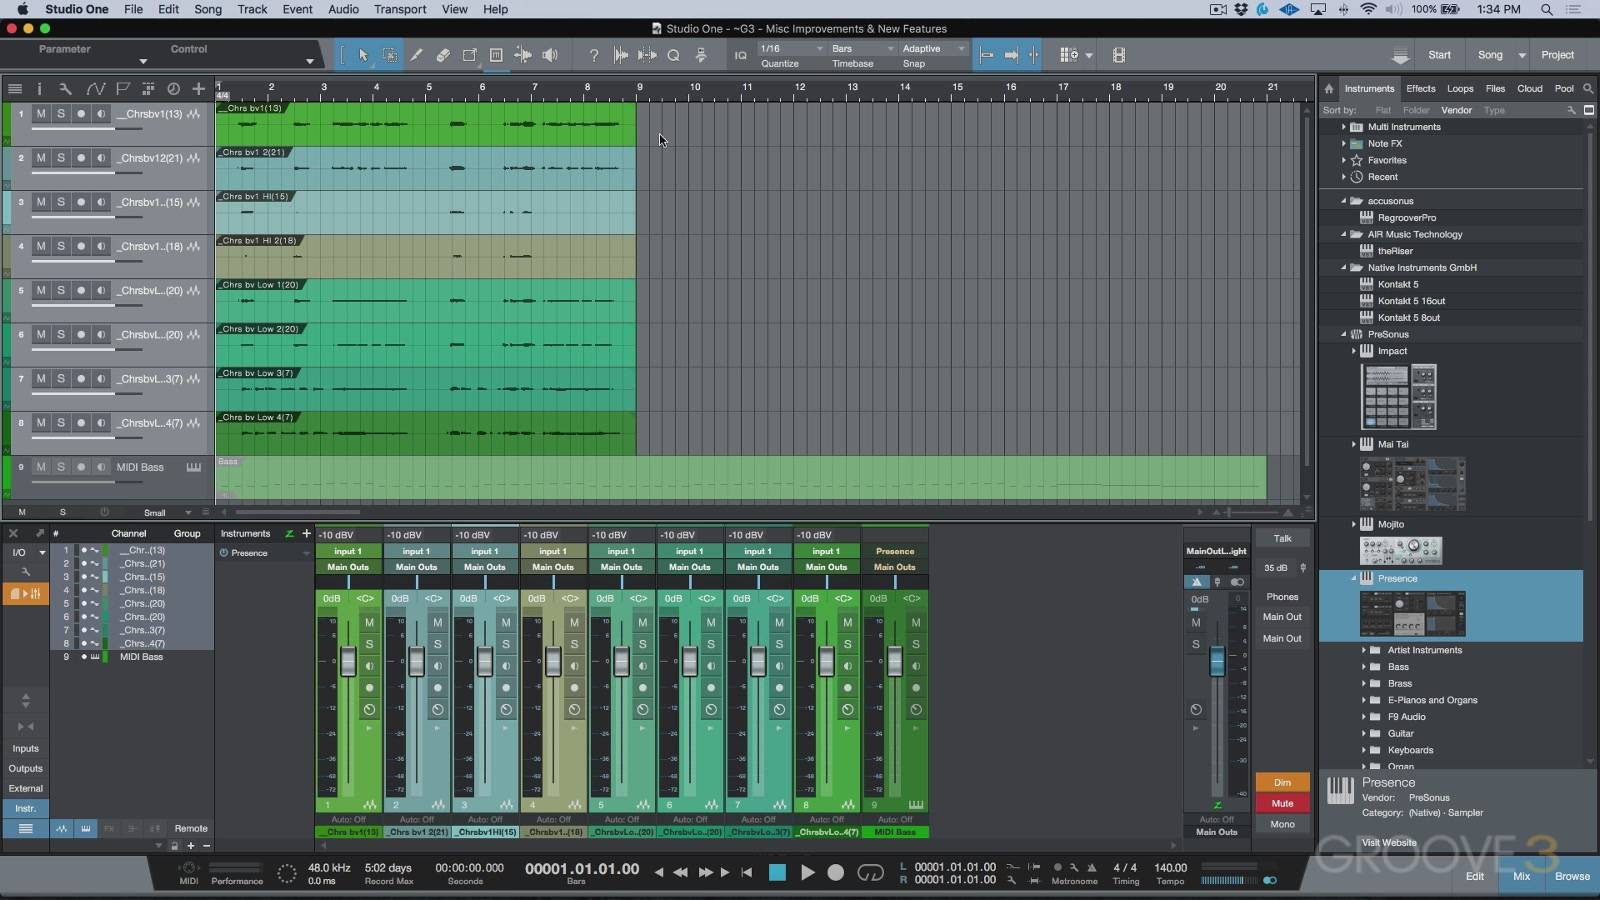 Groove3 - Studio One 3.5 Update Explained (2017)